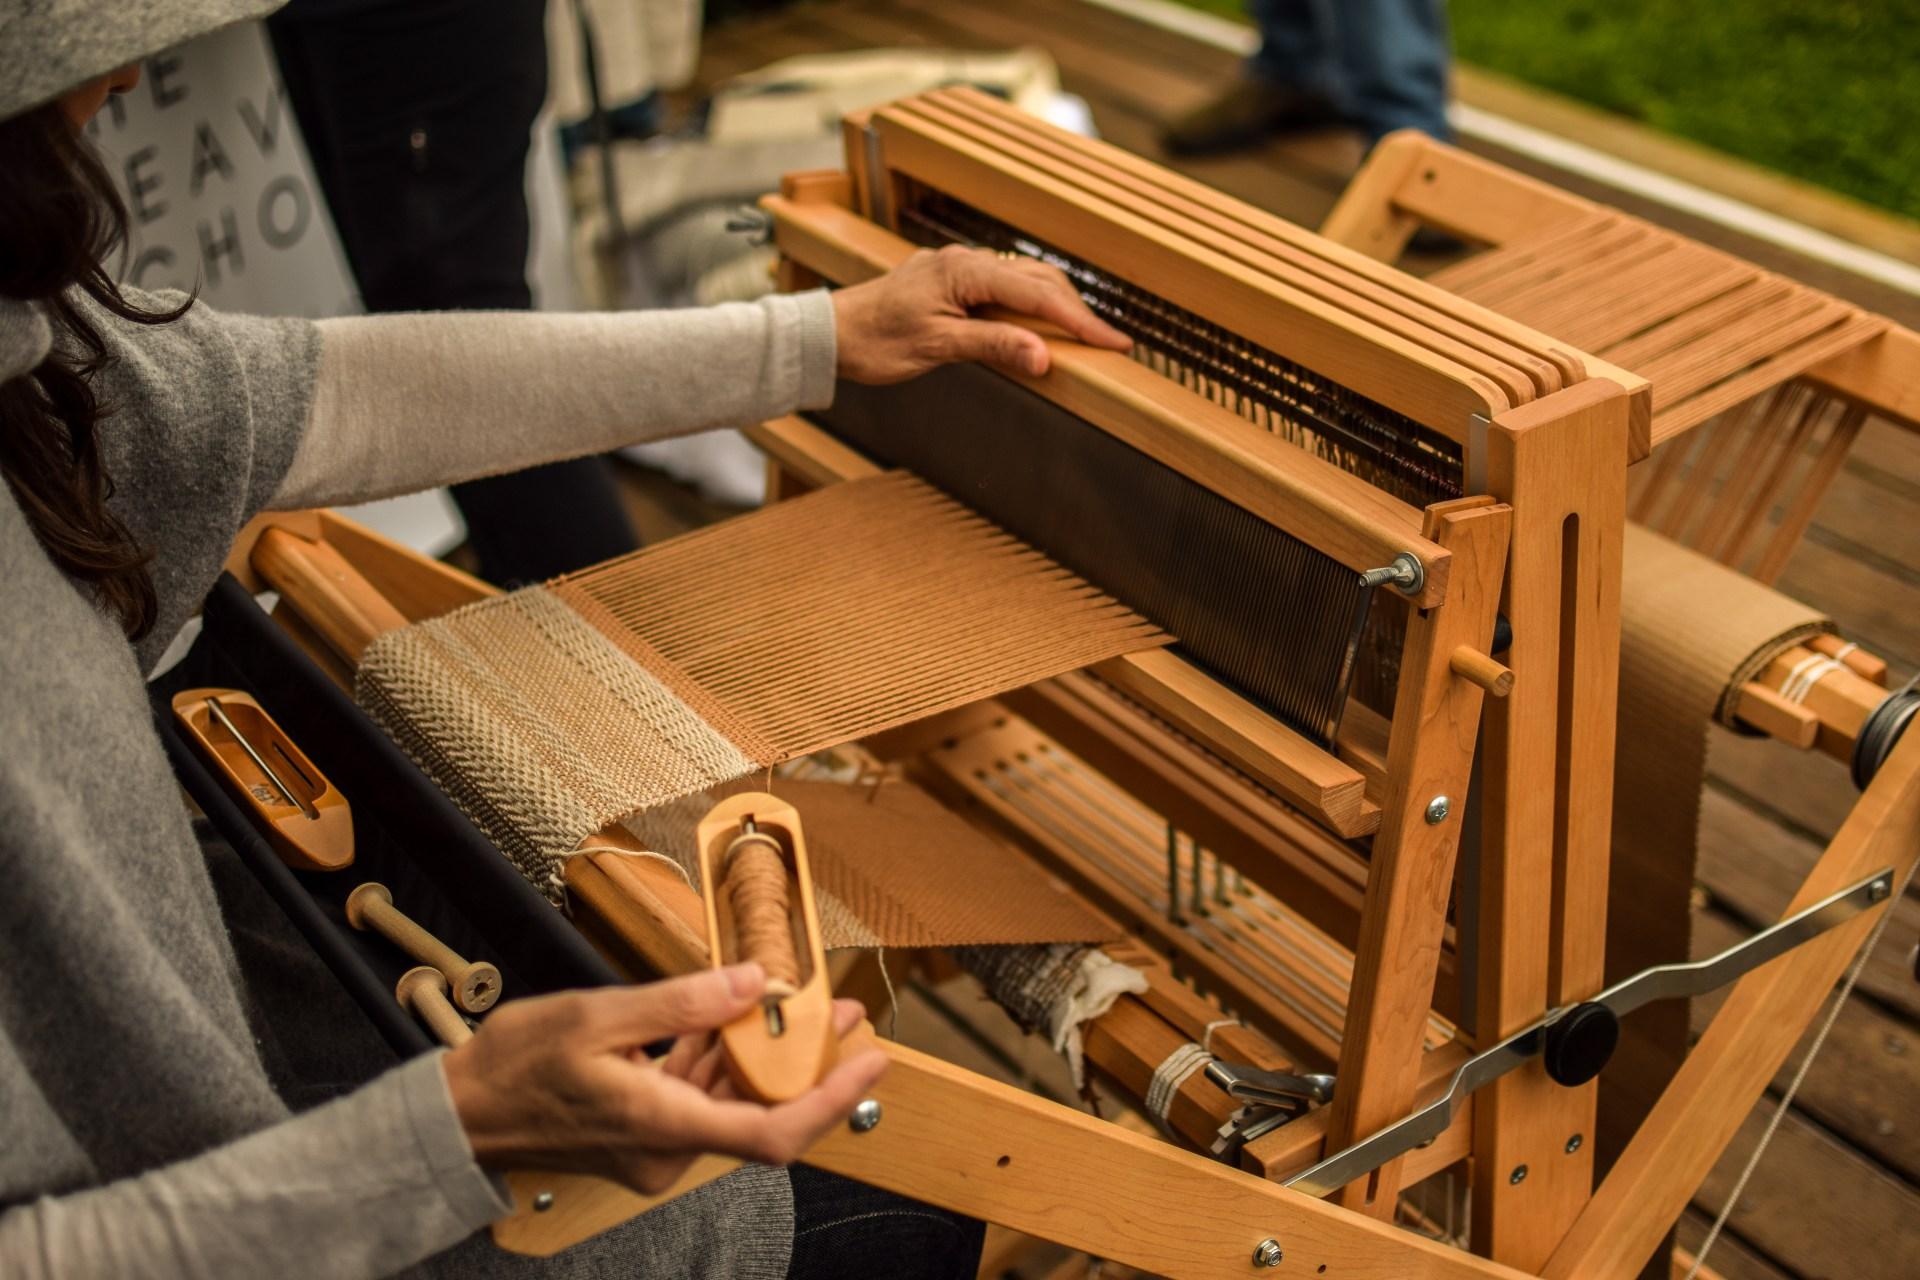 Fibershed Wool Symposium by Odyssey Designs